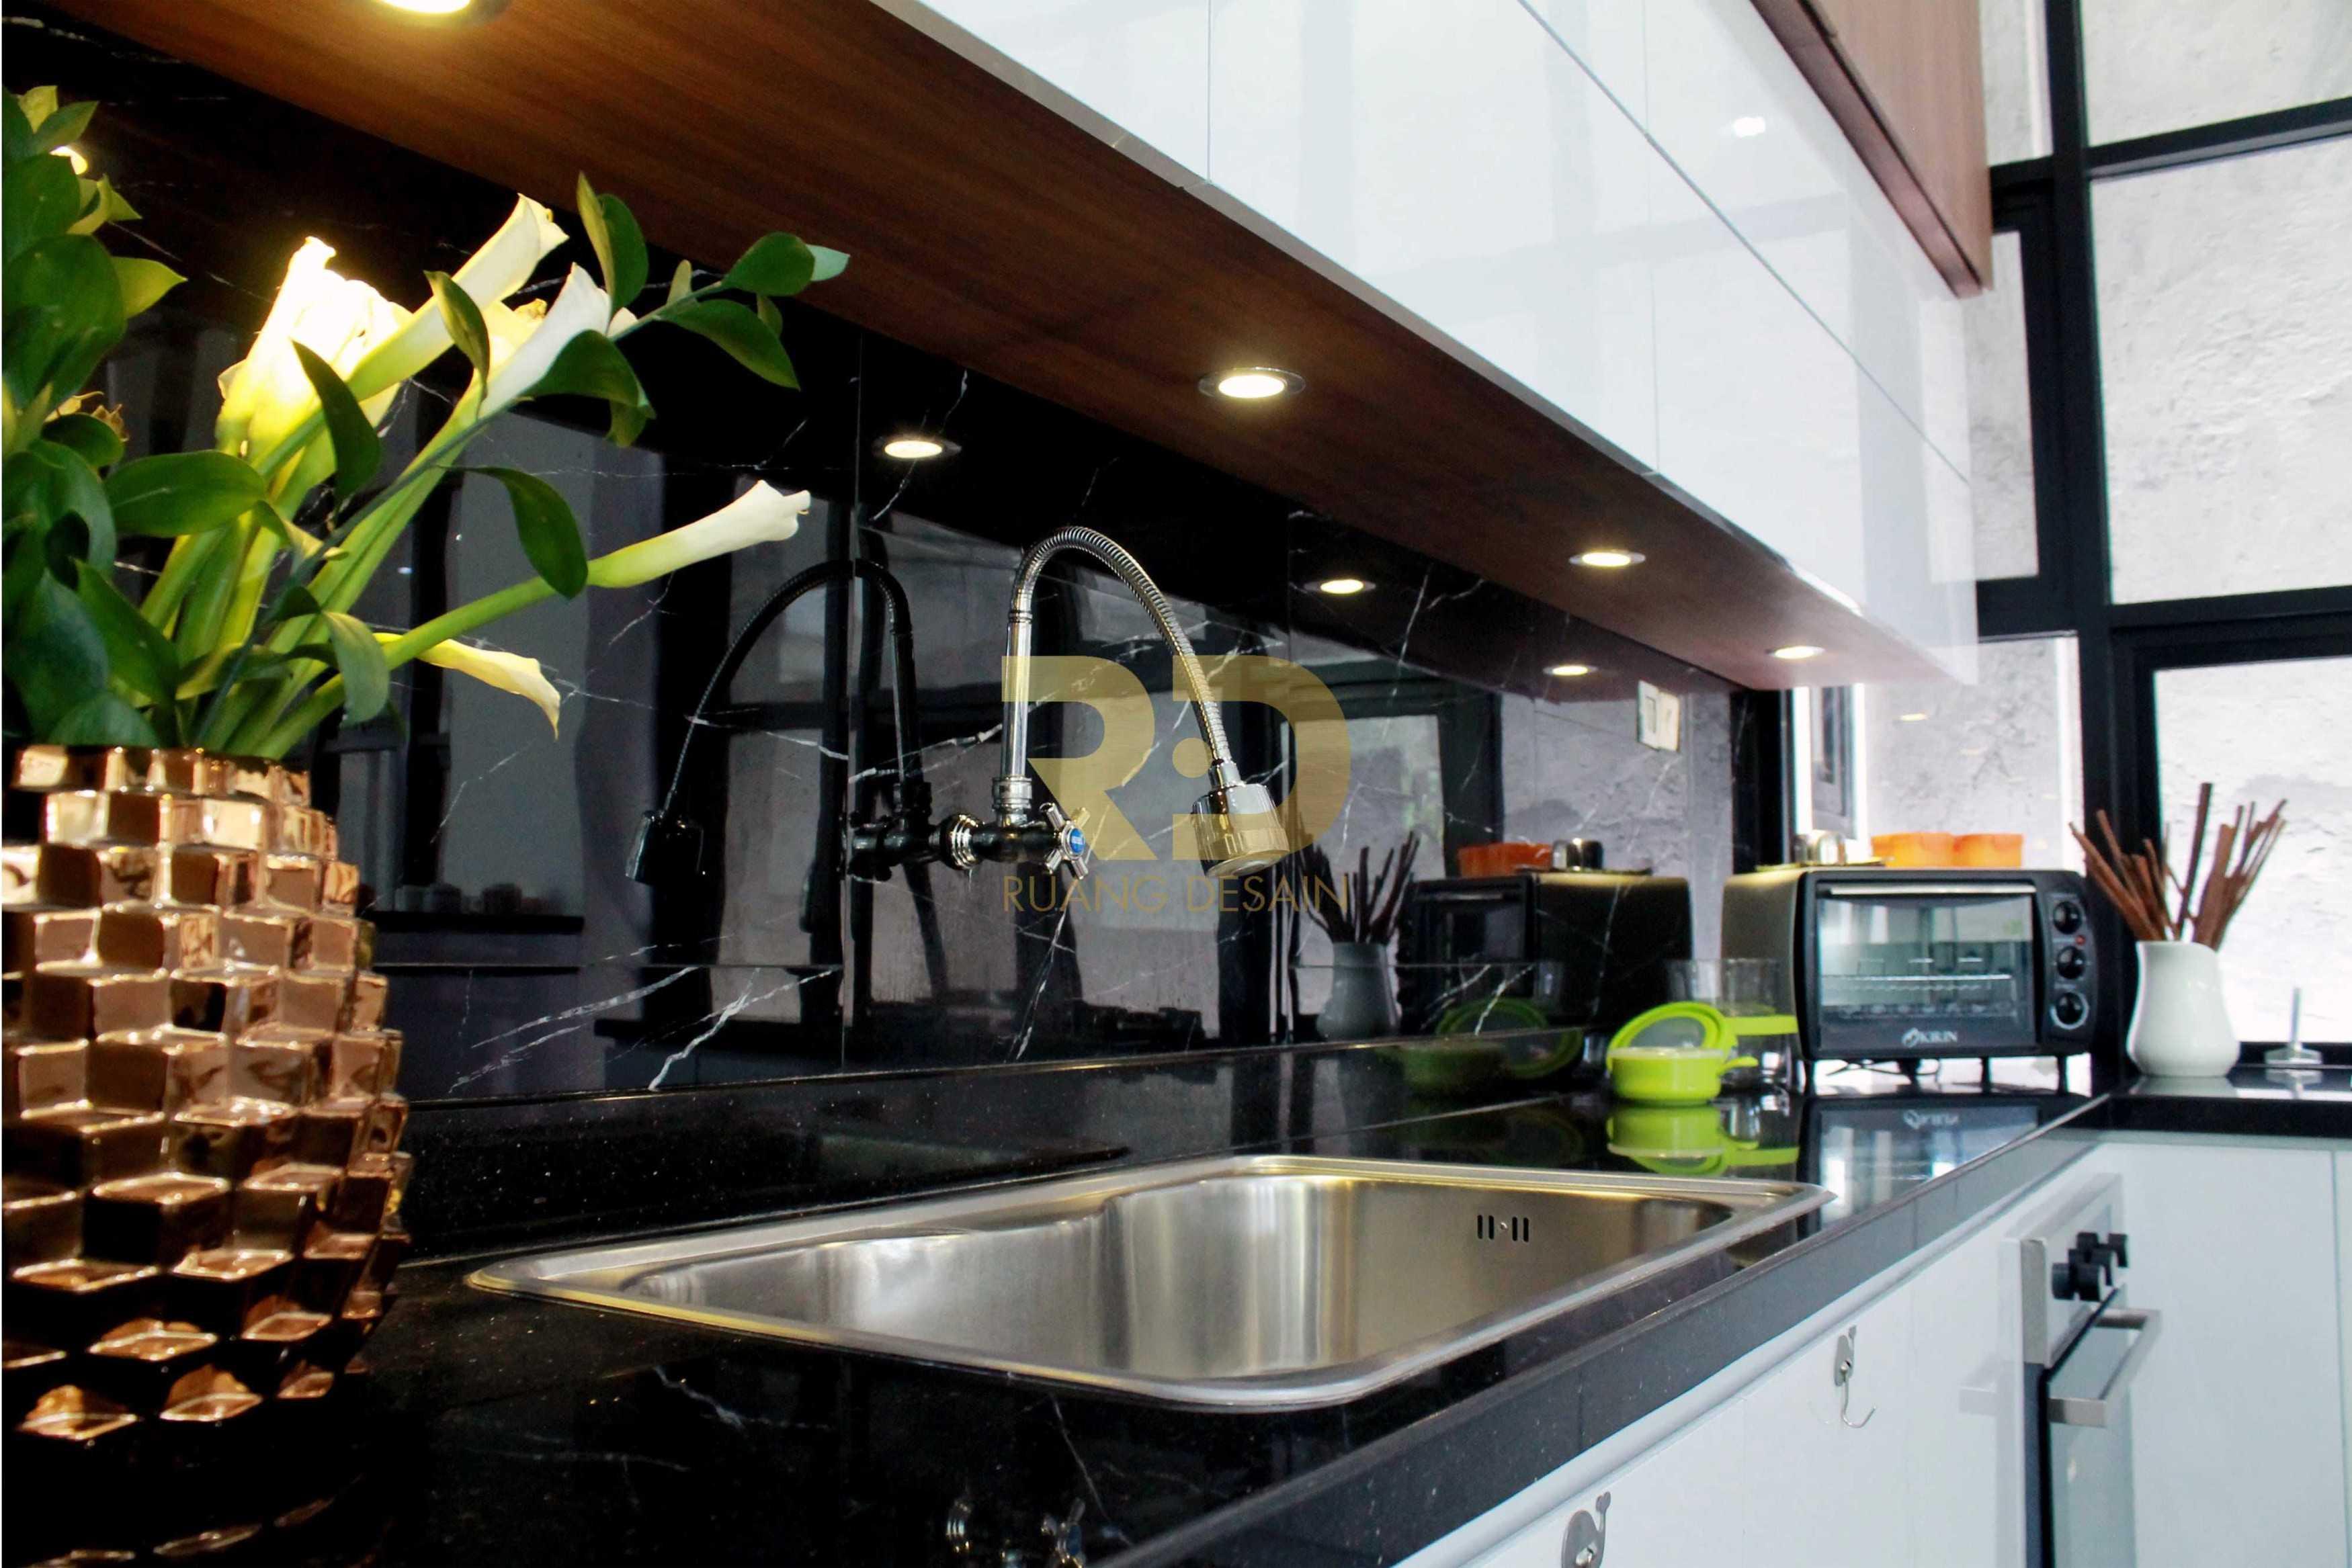 Ruang Desain White And Wood Surabaya, Kota Sby, Jawa Timur, Indonesia Surabaya, Kota Sby, Jawa Timur, Indonesia Ruang-Desain-White-And-Wood   92002